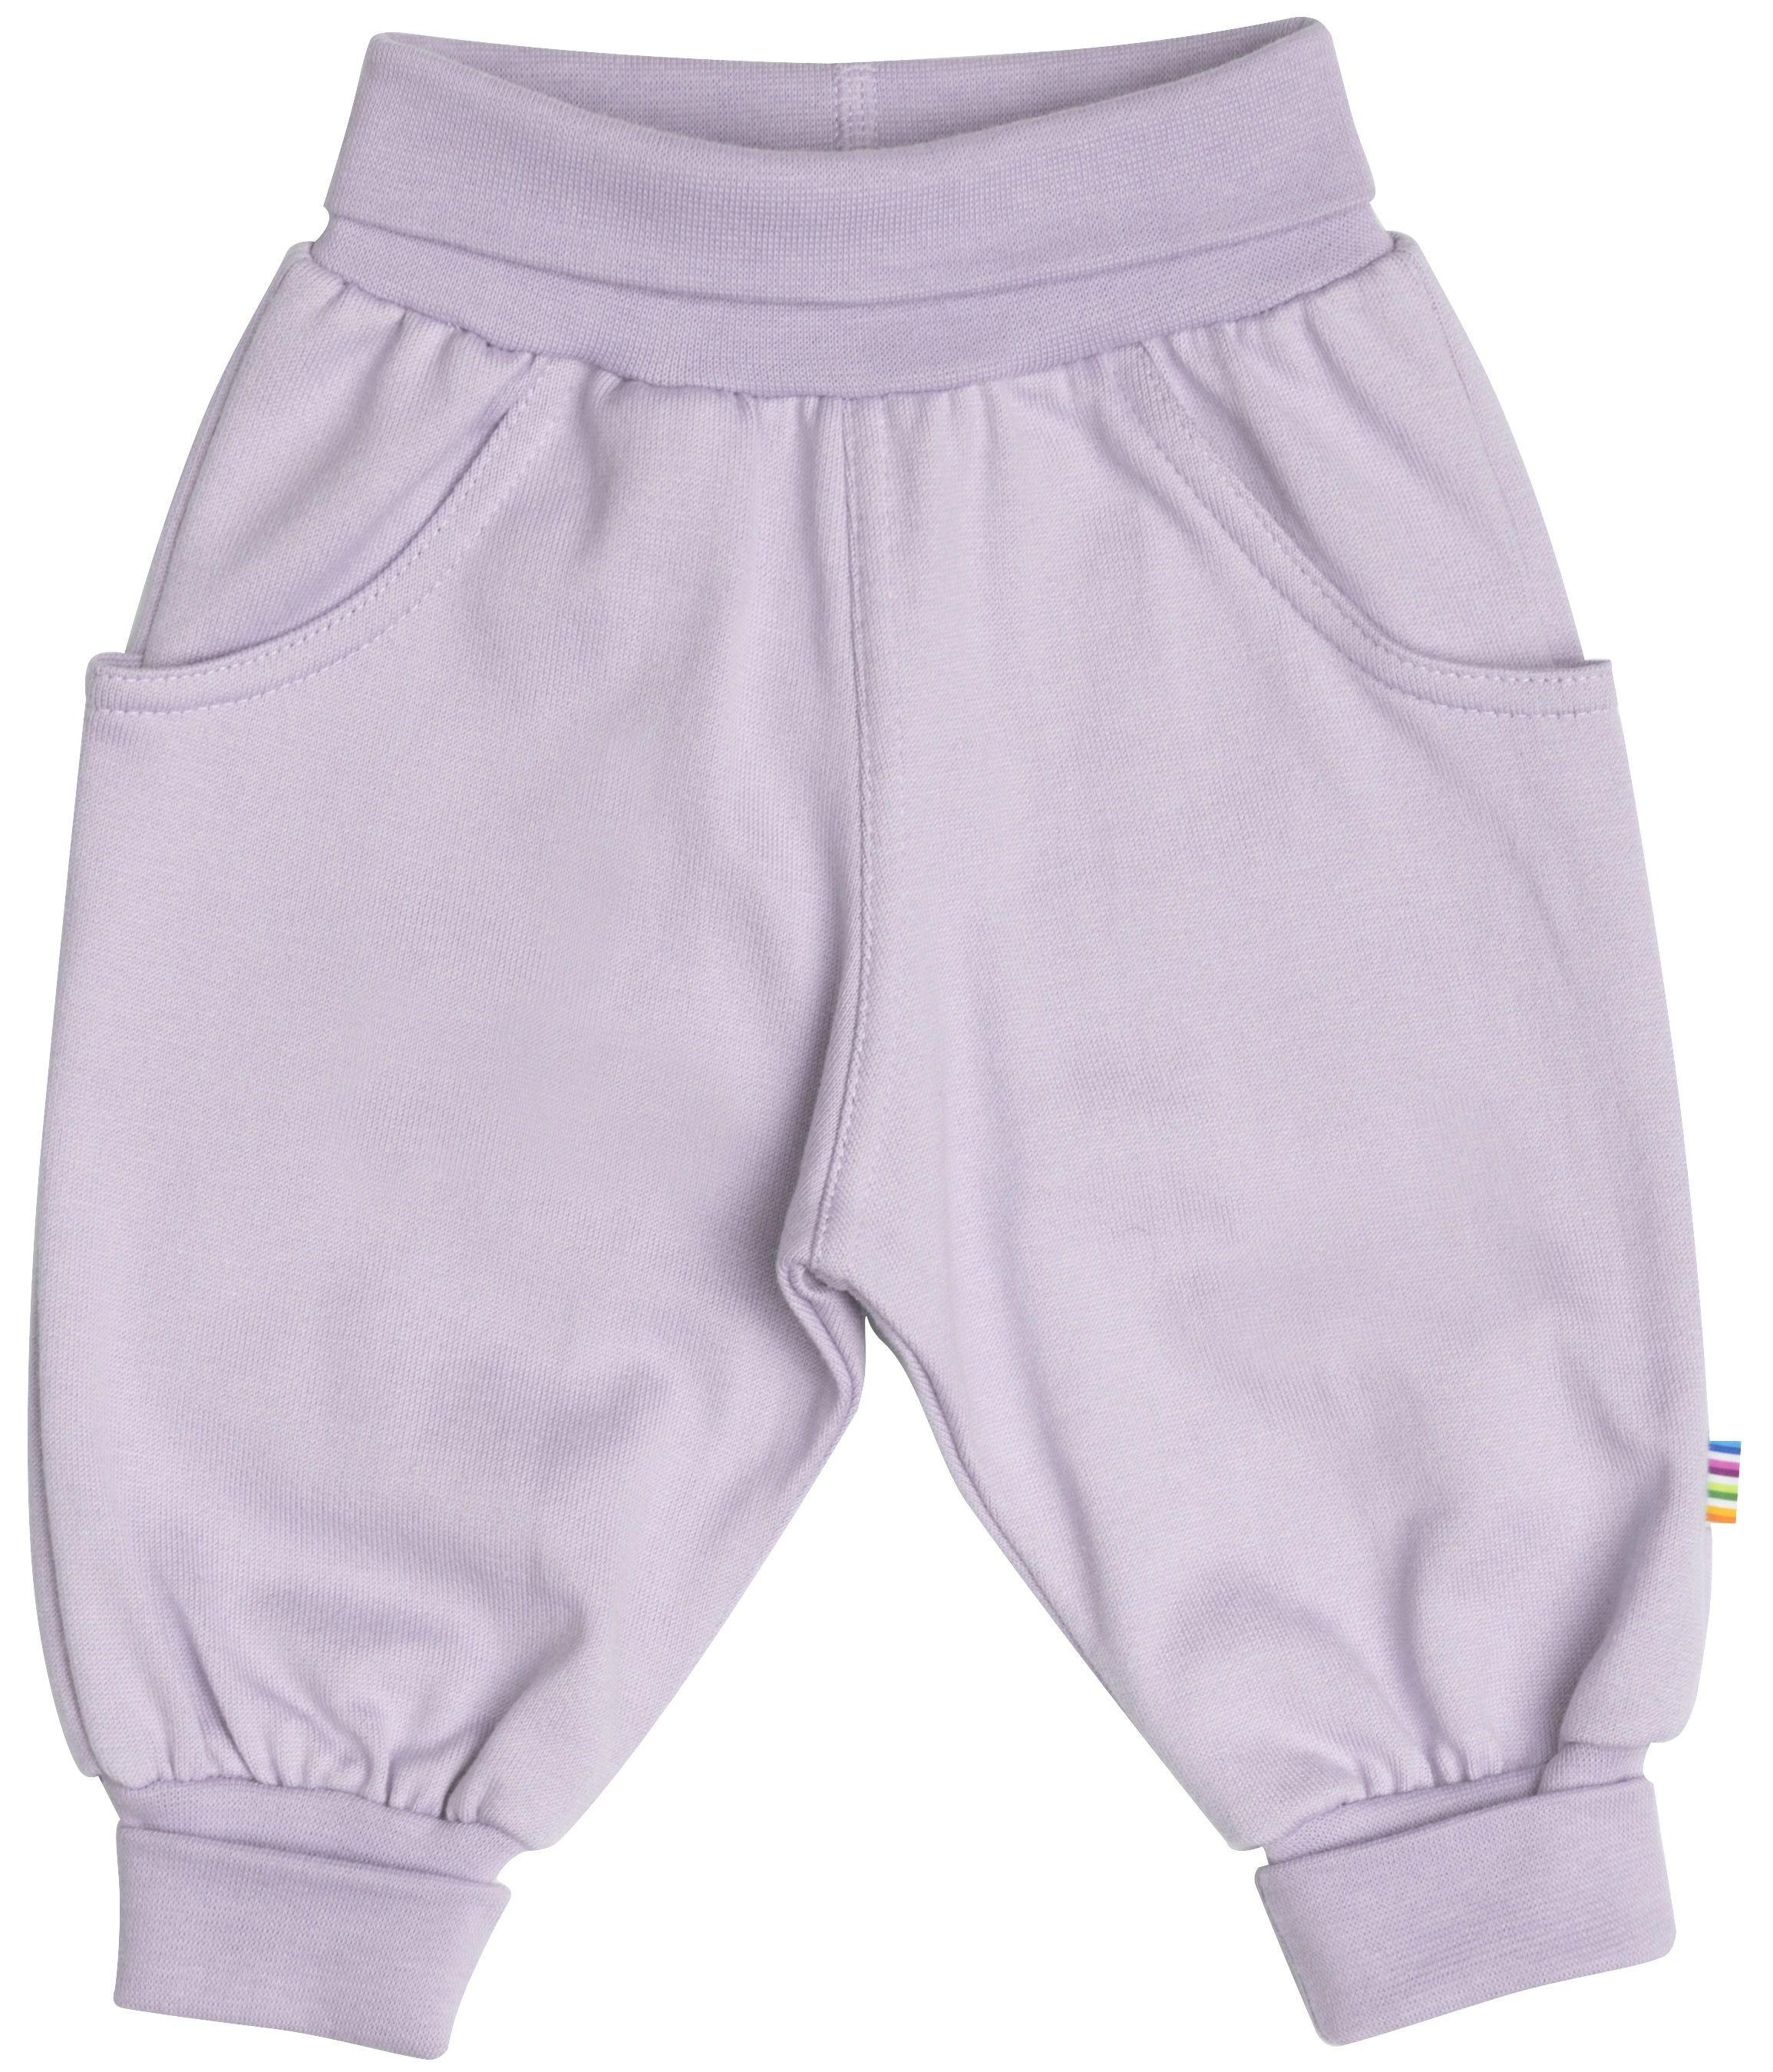 Image of Baggy Pants fra Joha i økologisk bomuld - Dusty Purple (29512-308-15564)